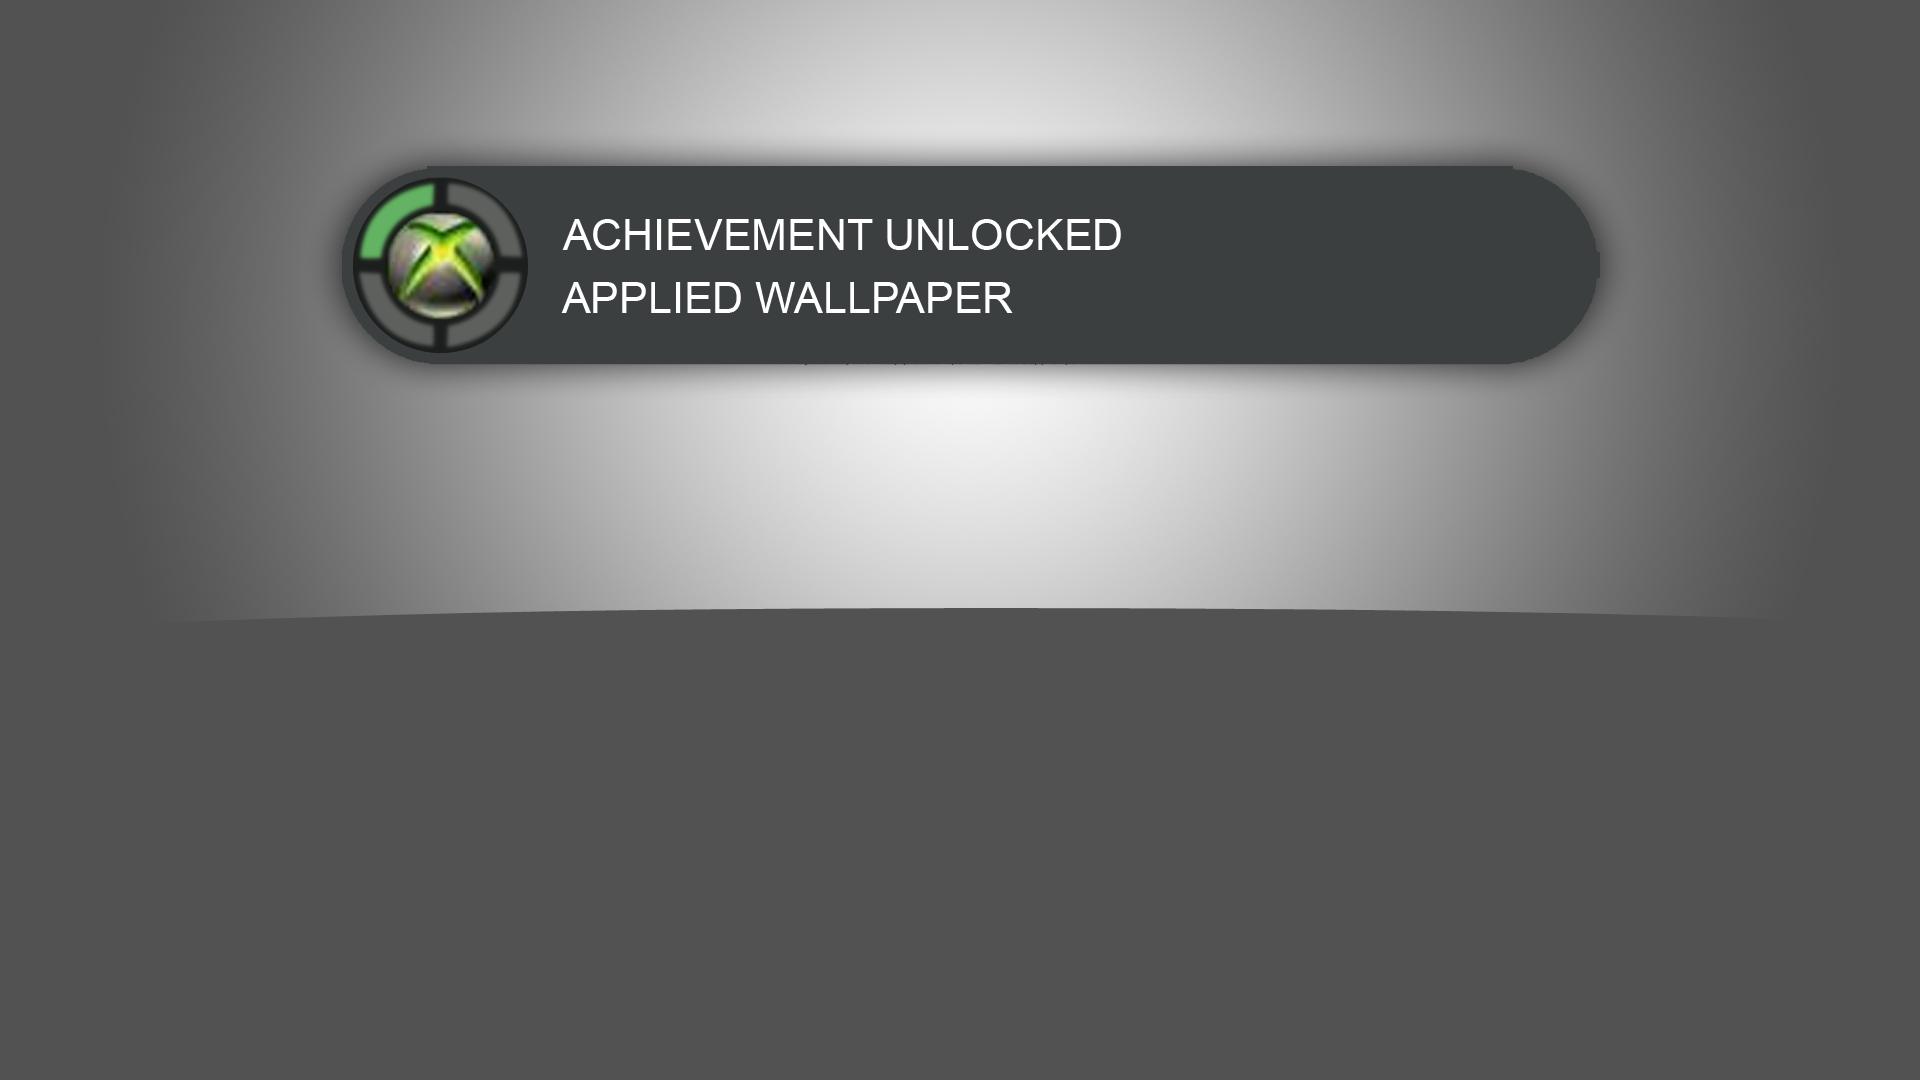 Wallpaper Calendar Version Unlock Code : Xbox one achievement wallpaper wallpapersafari